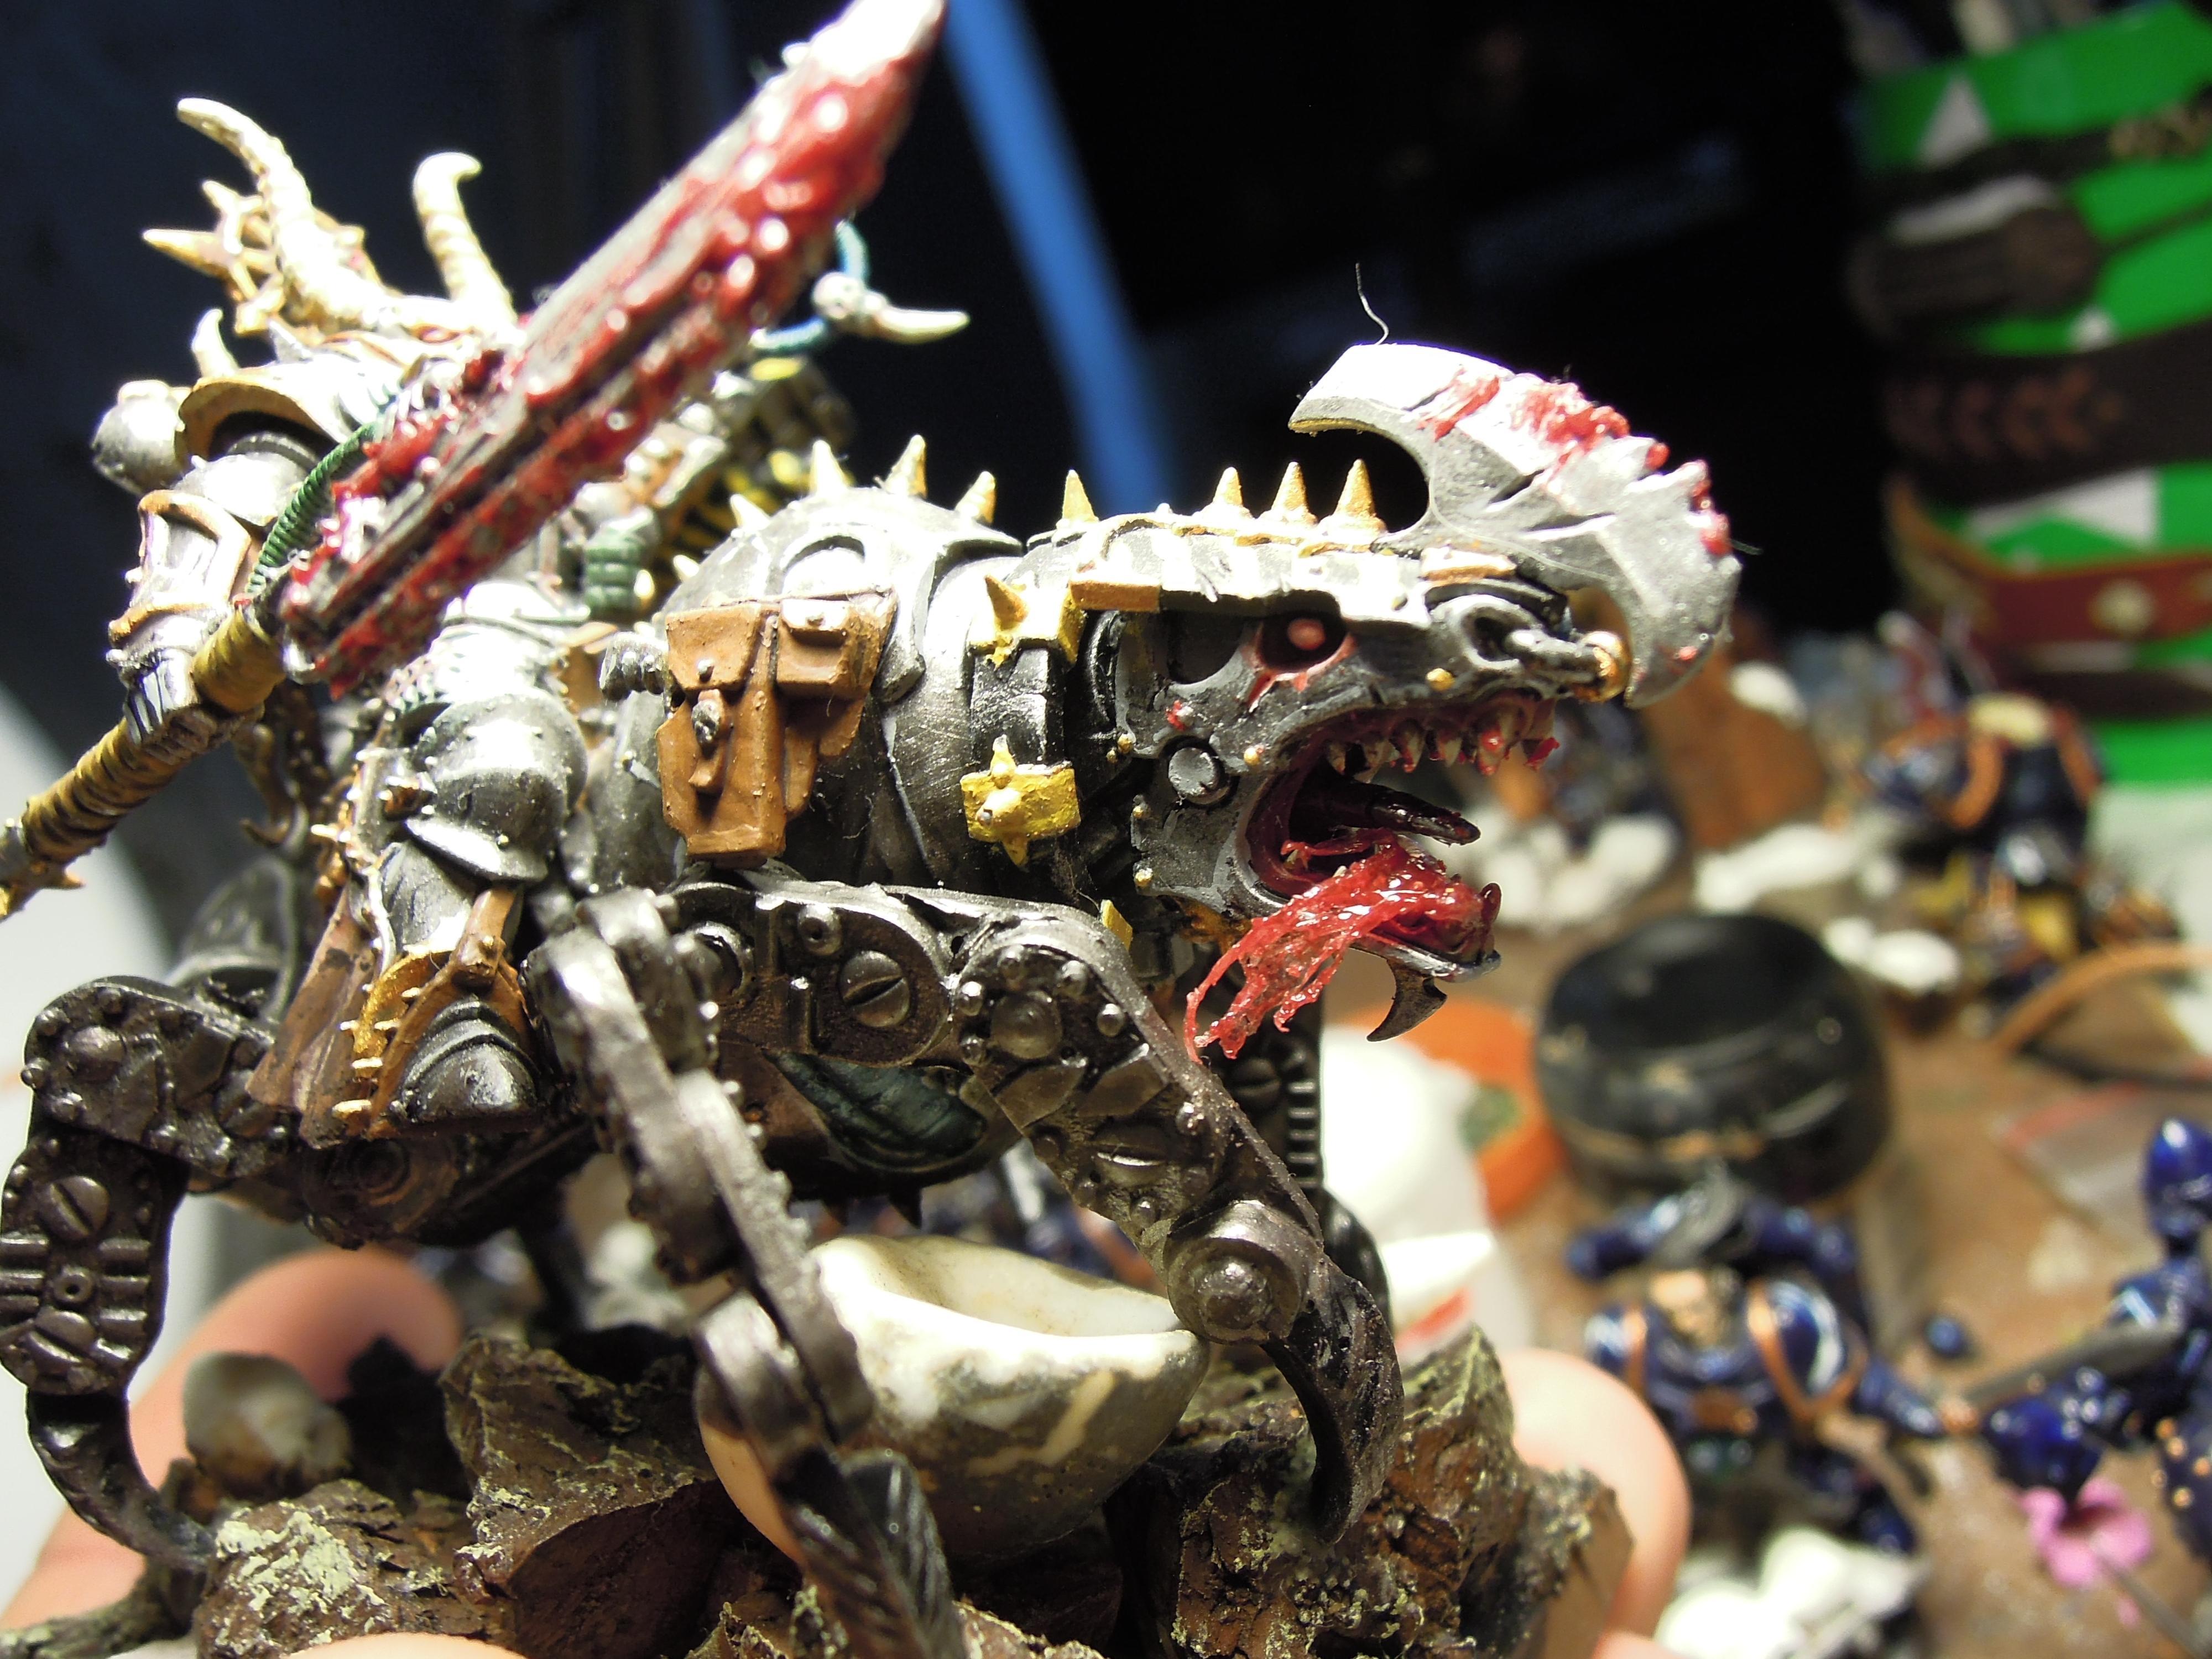 Blood, Chaos, Chaos Space Marines, Conversion, Glaive, Iron Warriors, Juggernaut, Meltagun, Servo Arm, Skullcrushers